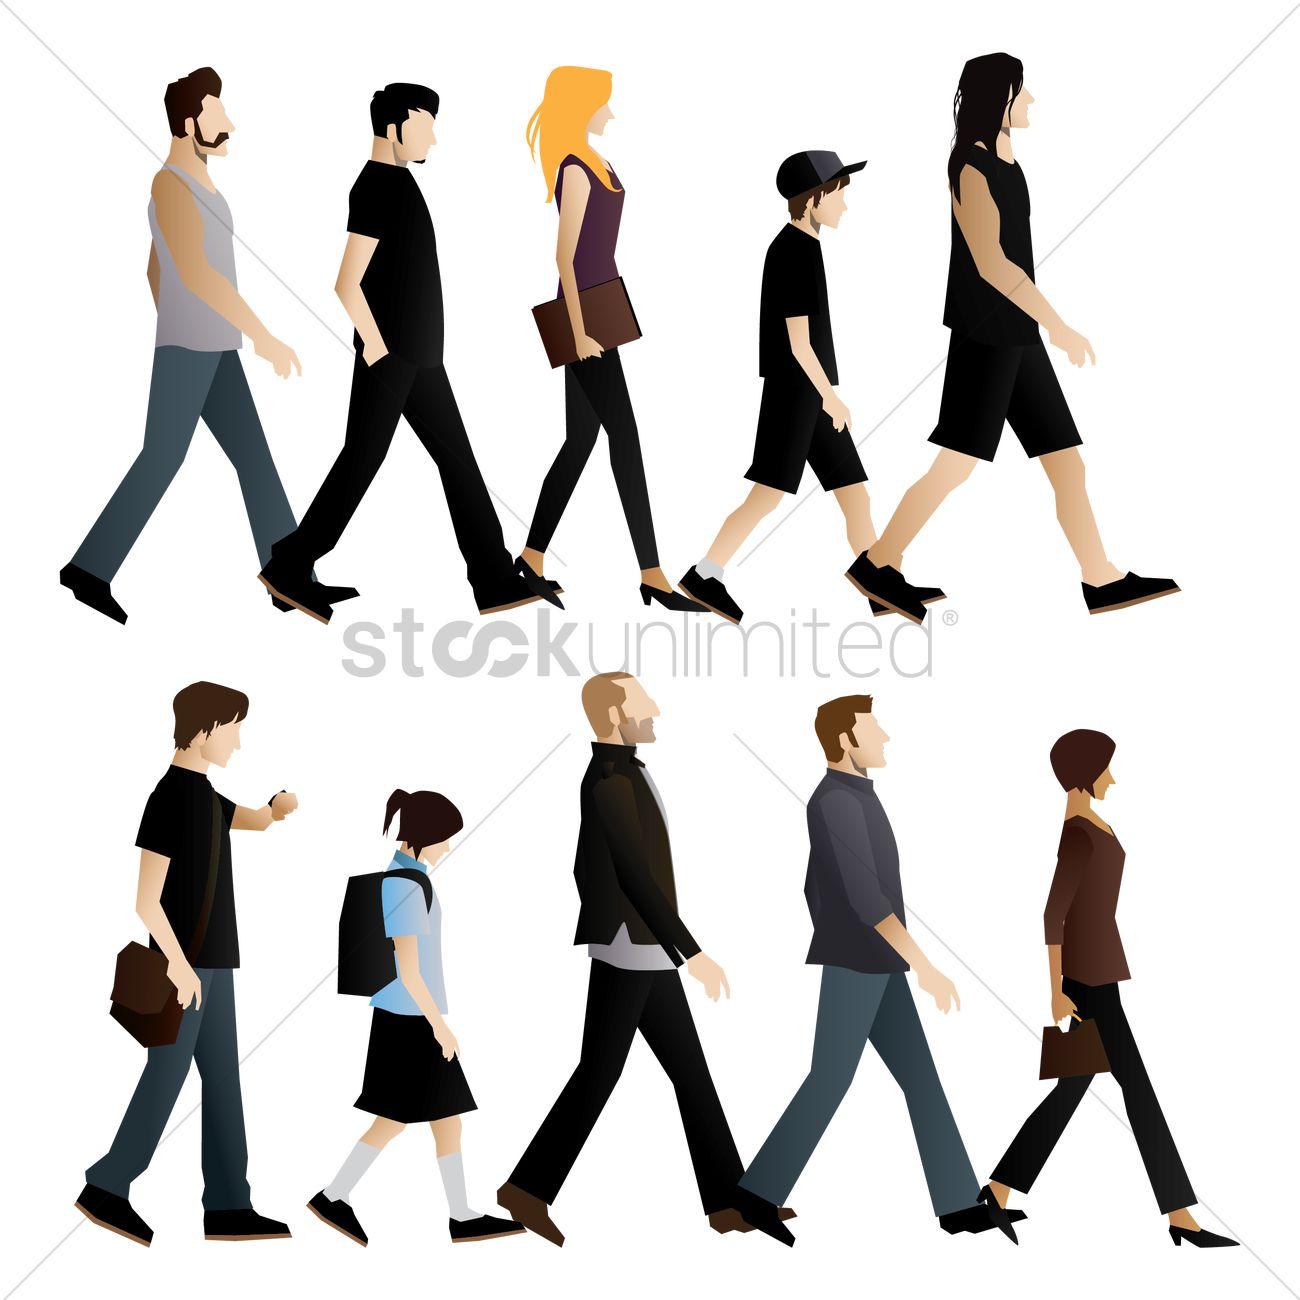 1300x1300 Free Set Of People Walking Vector Image